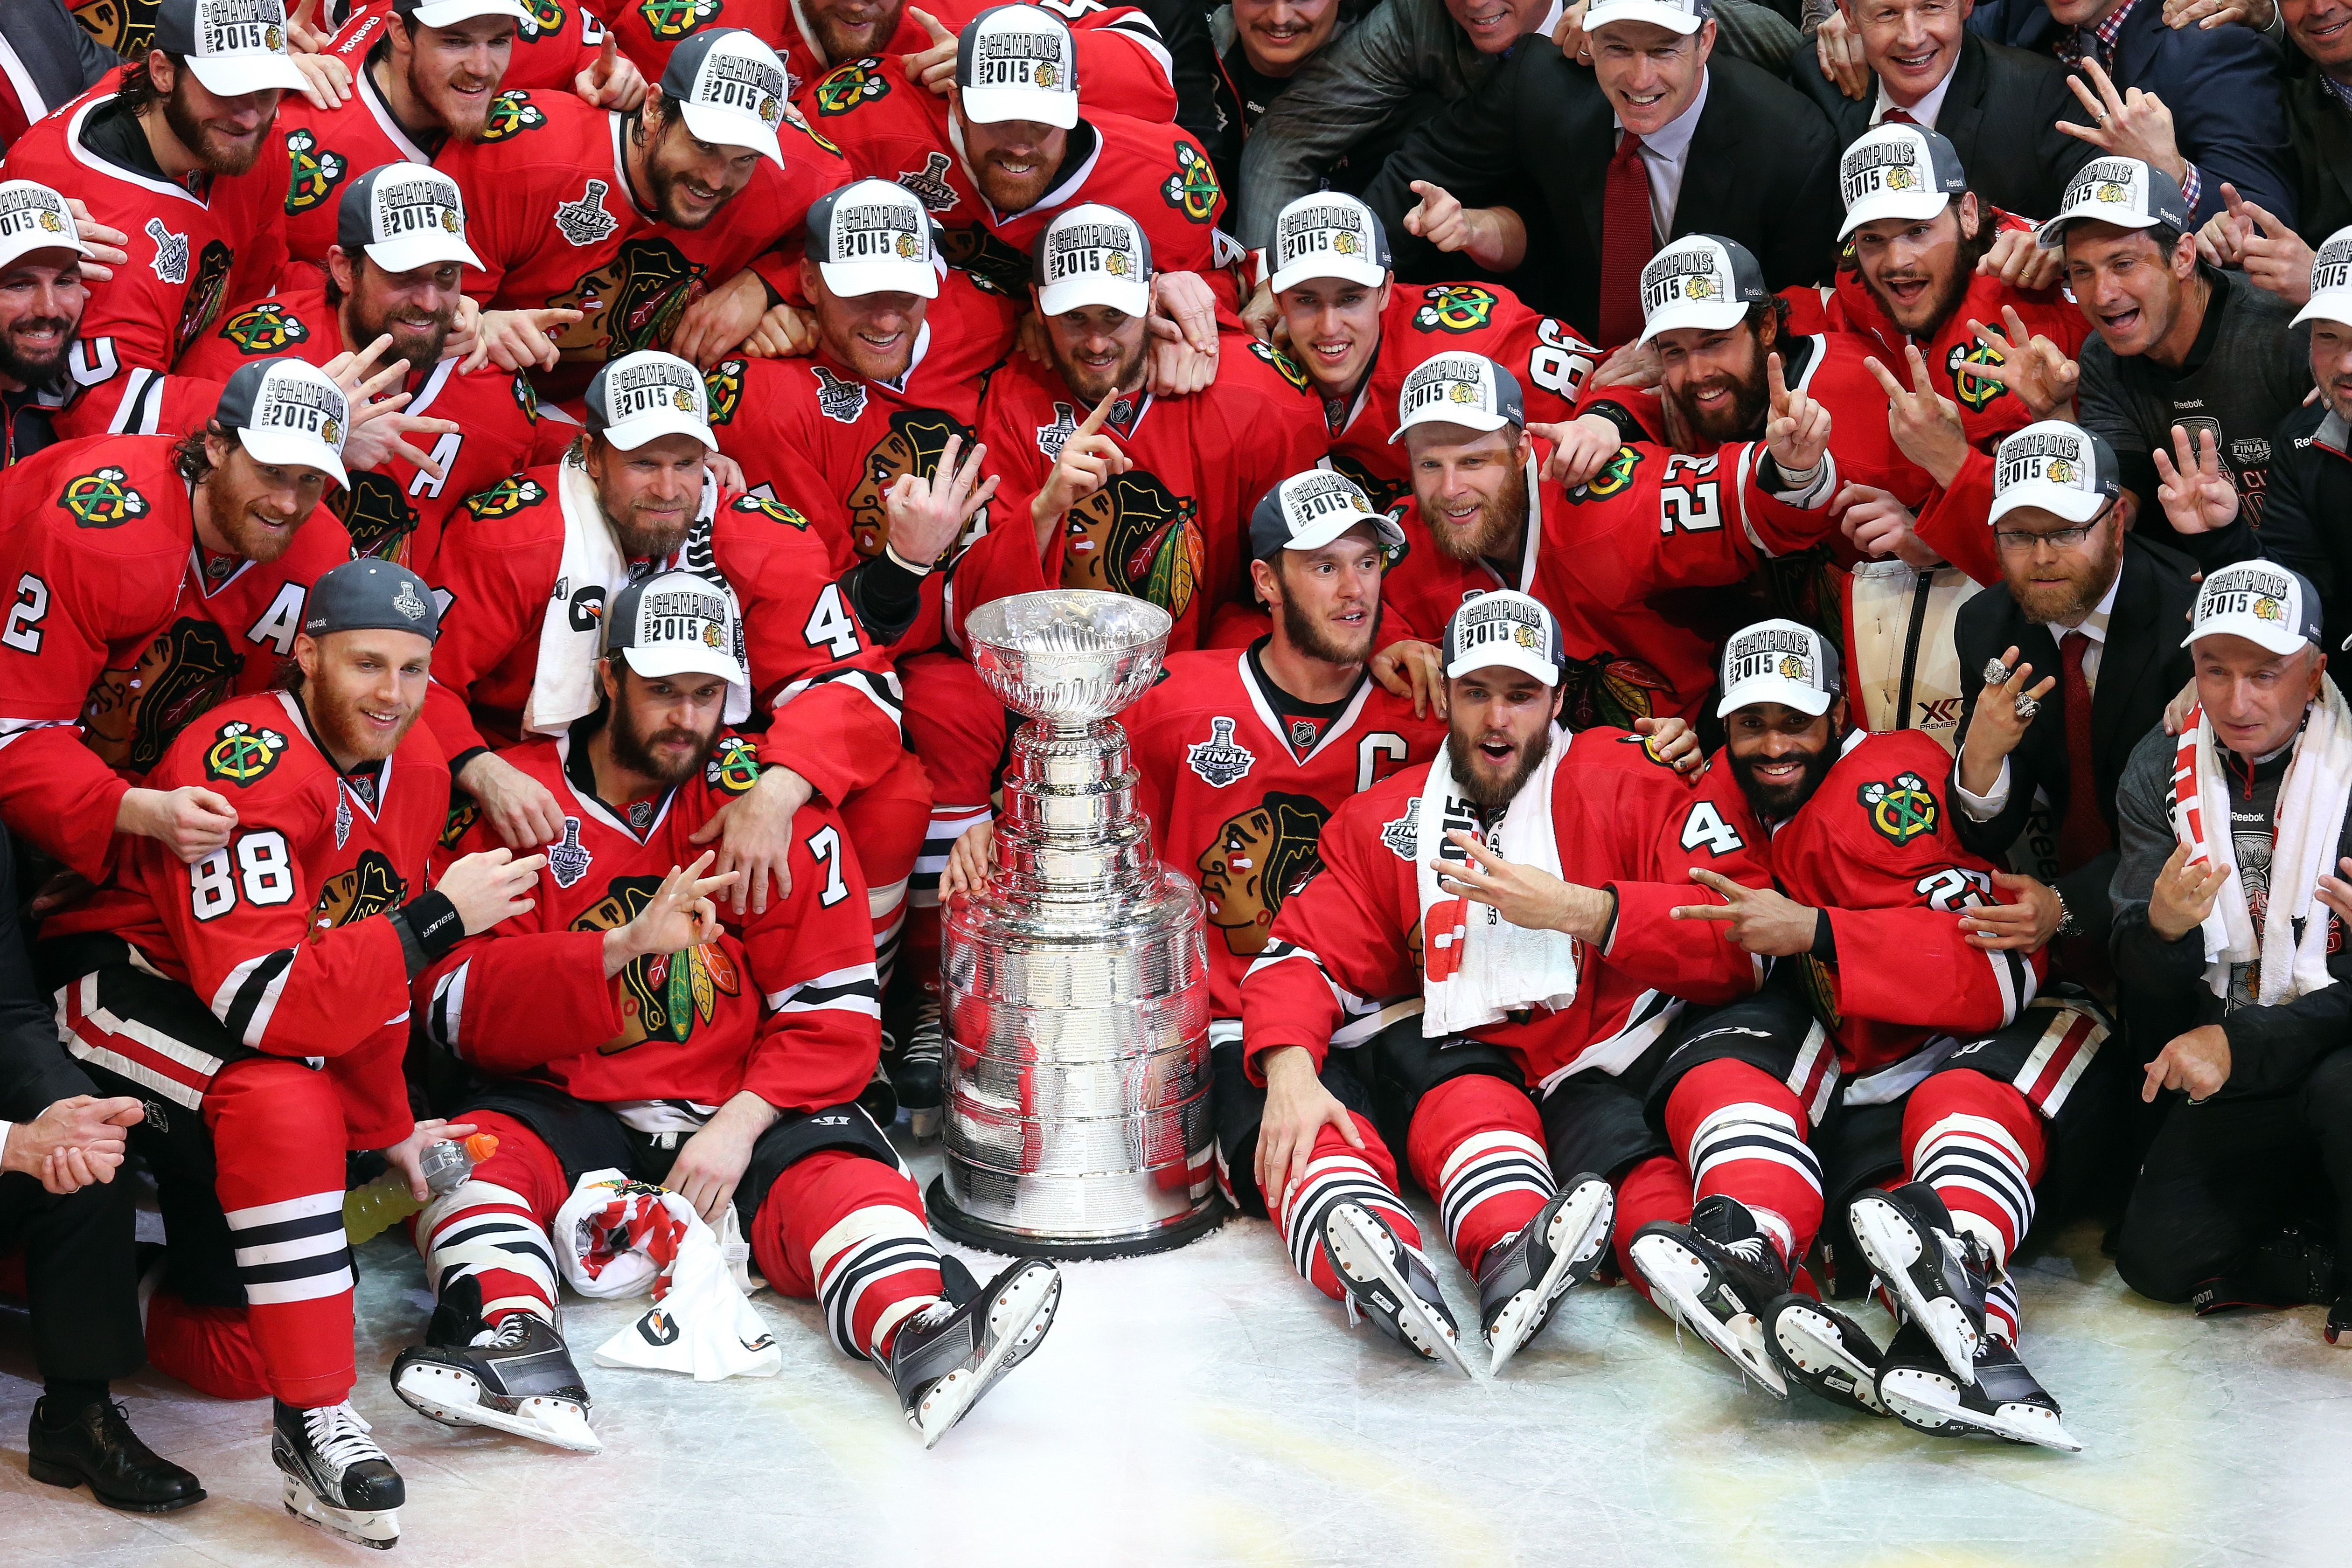 2015 Stanley Cup Champions Blackhawks Stanley Cup Blackhawks Hockey Blackhawks